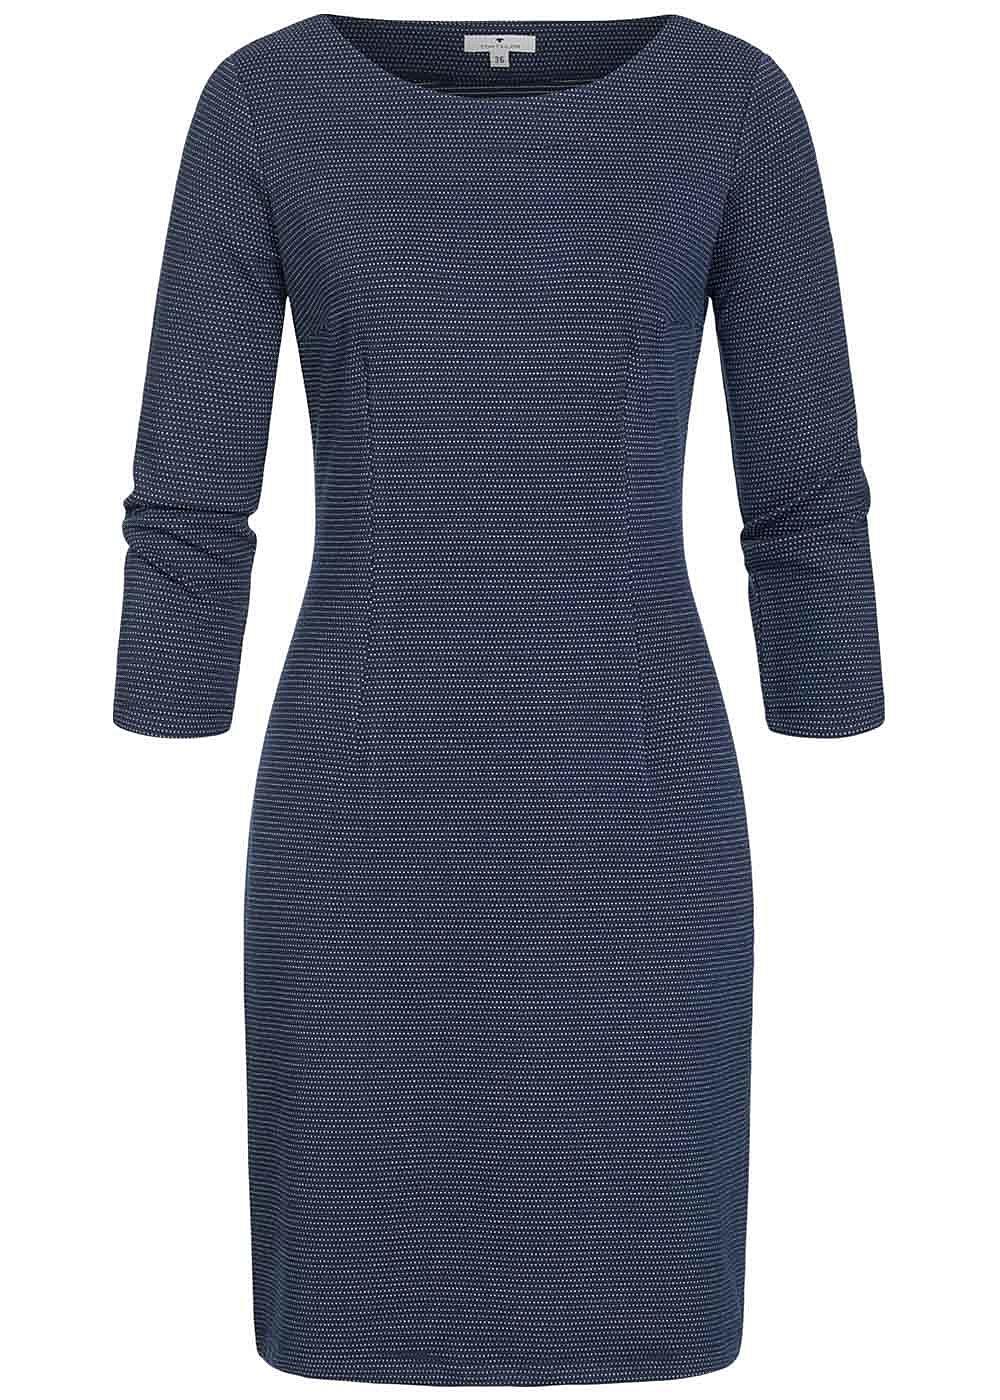 TOM TAILOR Damen 3/4 Arm Mini Kleid Punkte Muster navy ...